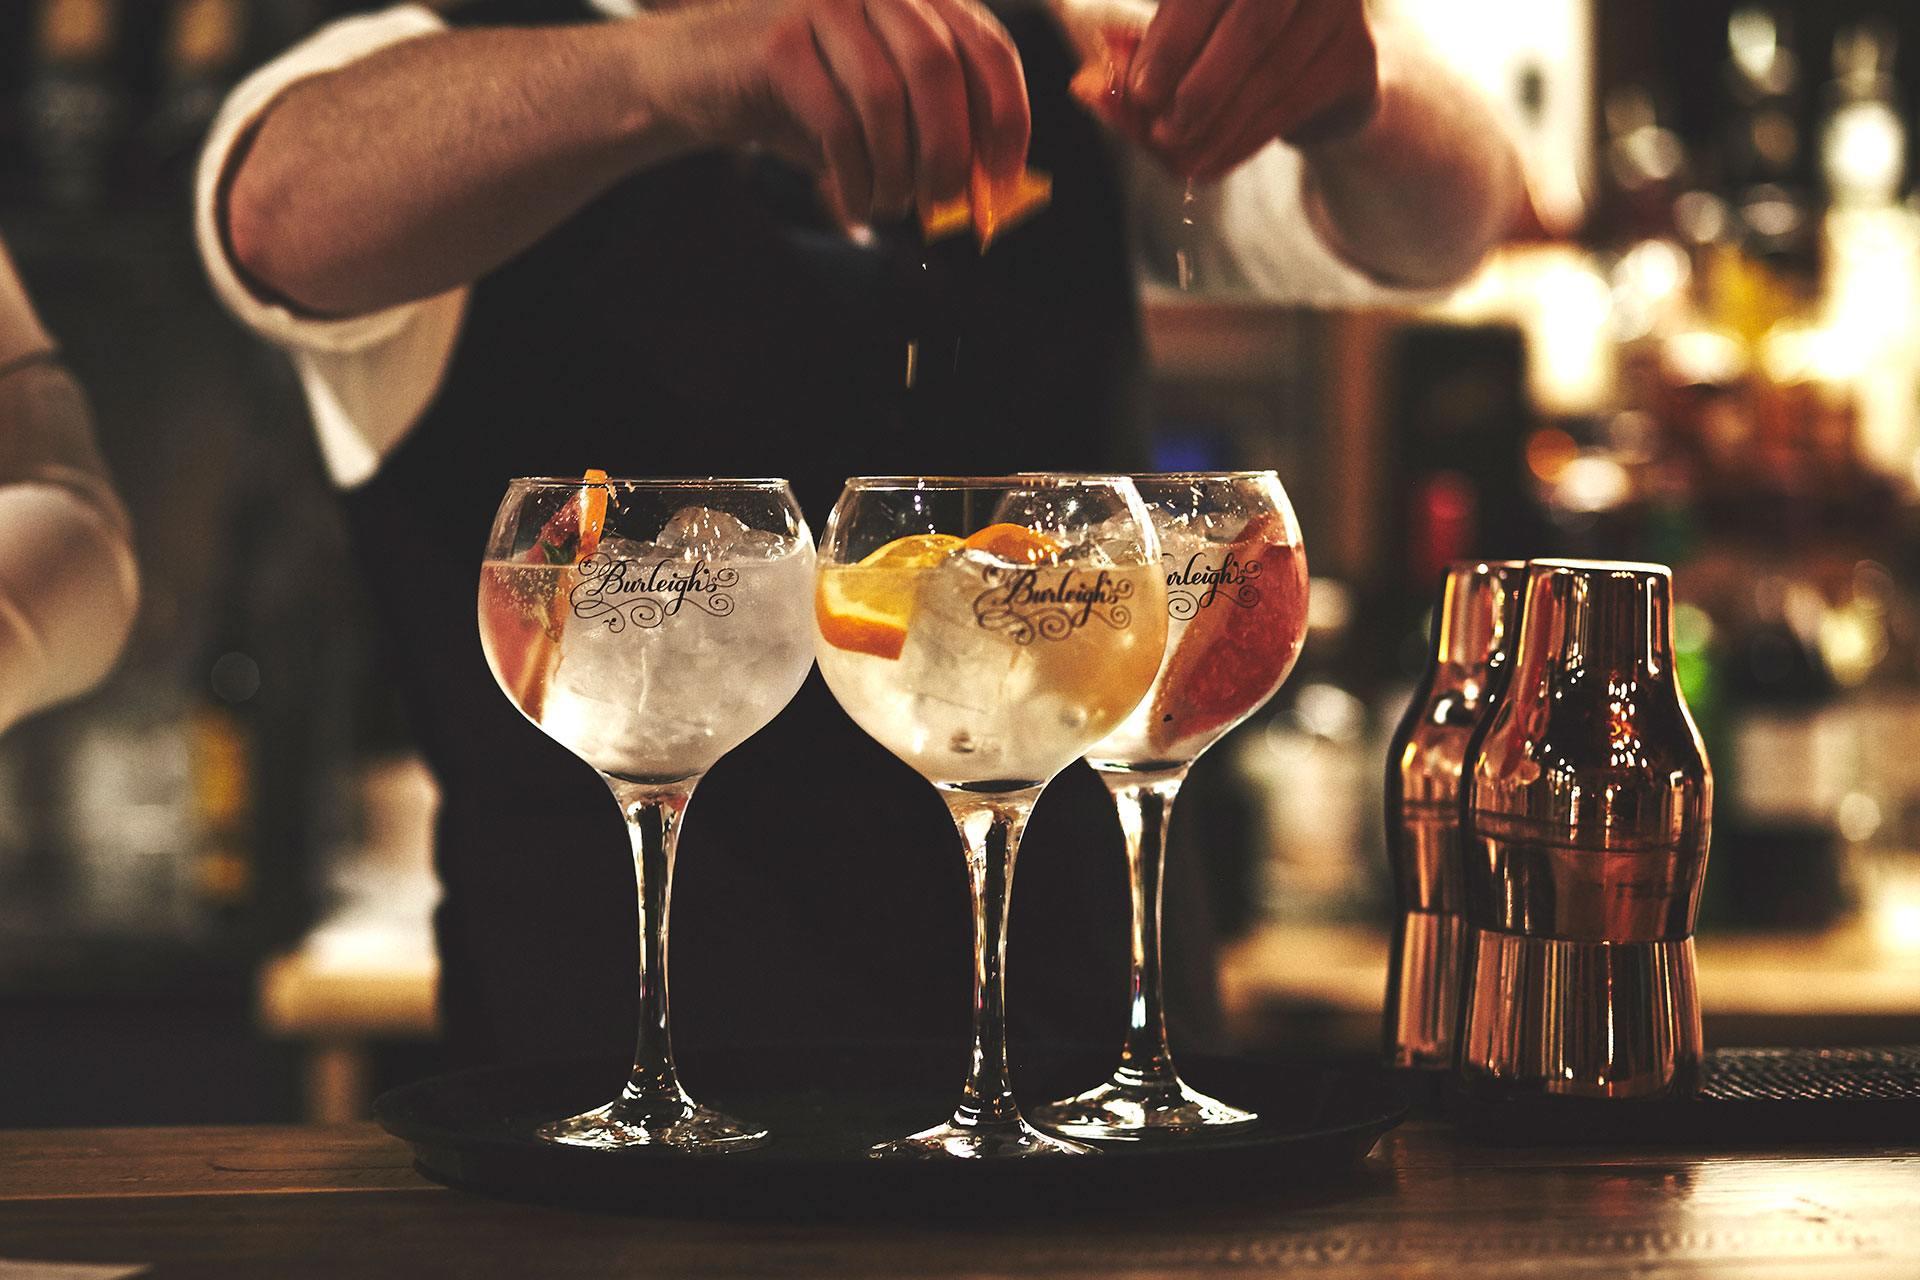 burleighs distillery